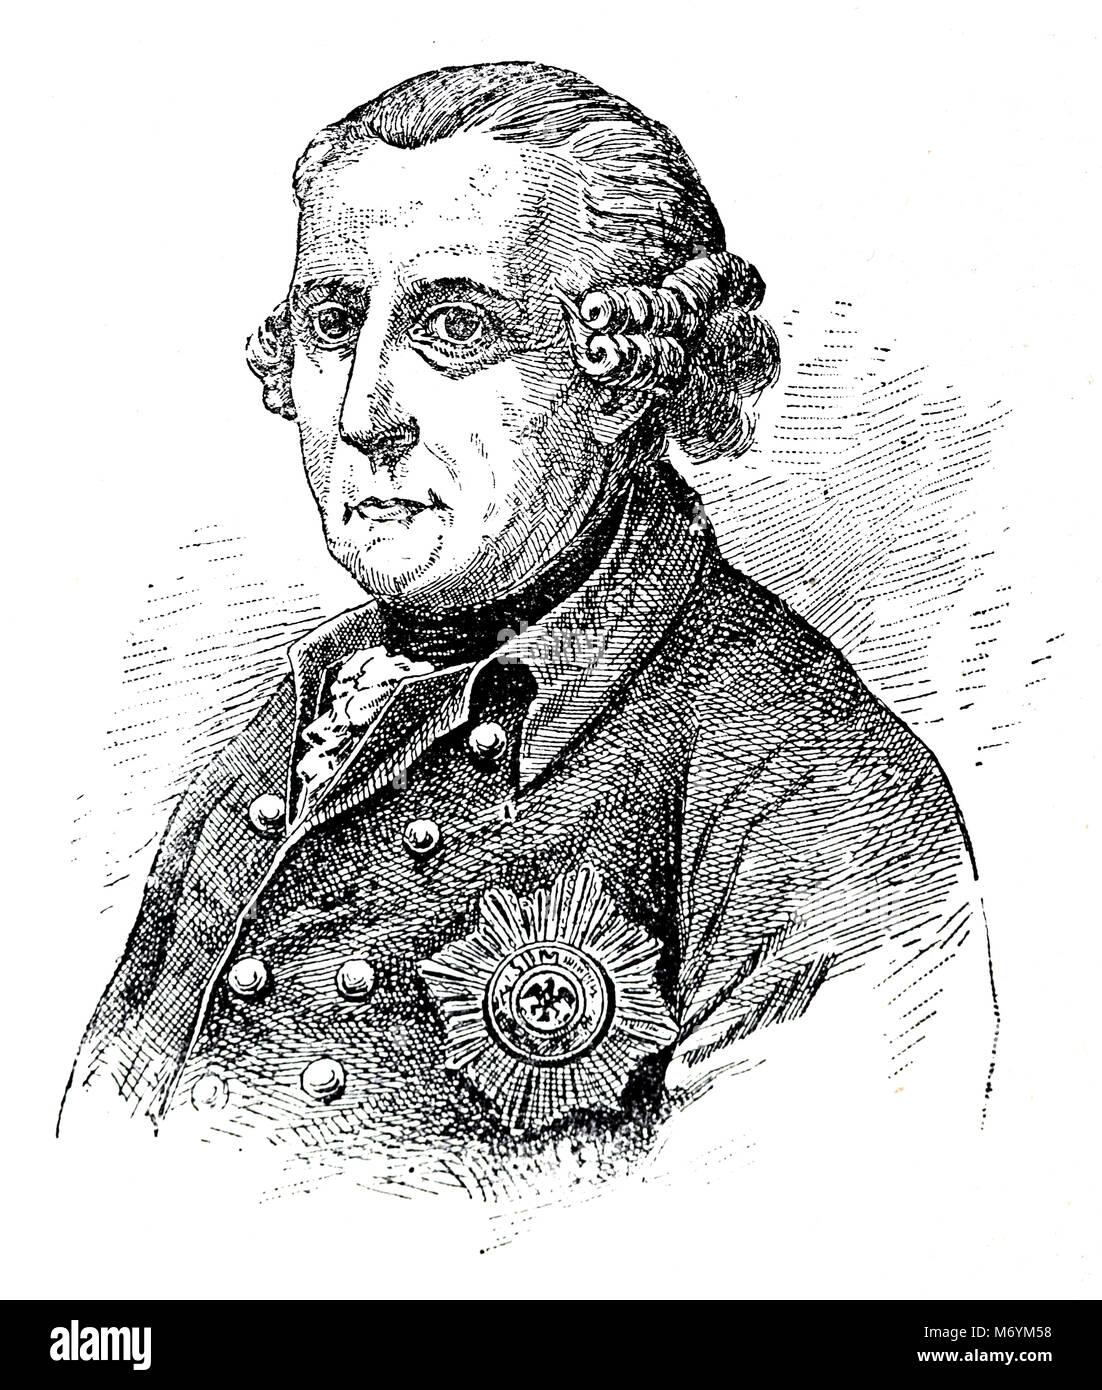 Frederick William II of Prussia (1744-1797). Portrait. Engraving, 19th century. Stock Photo